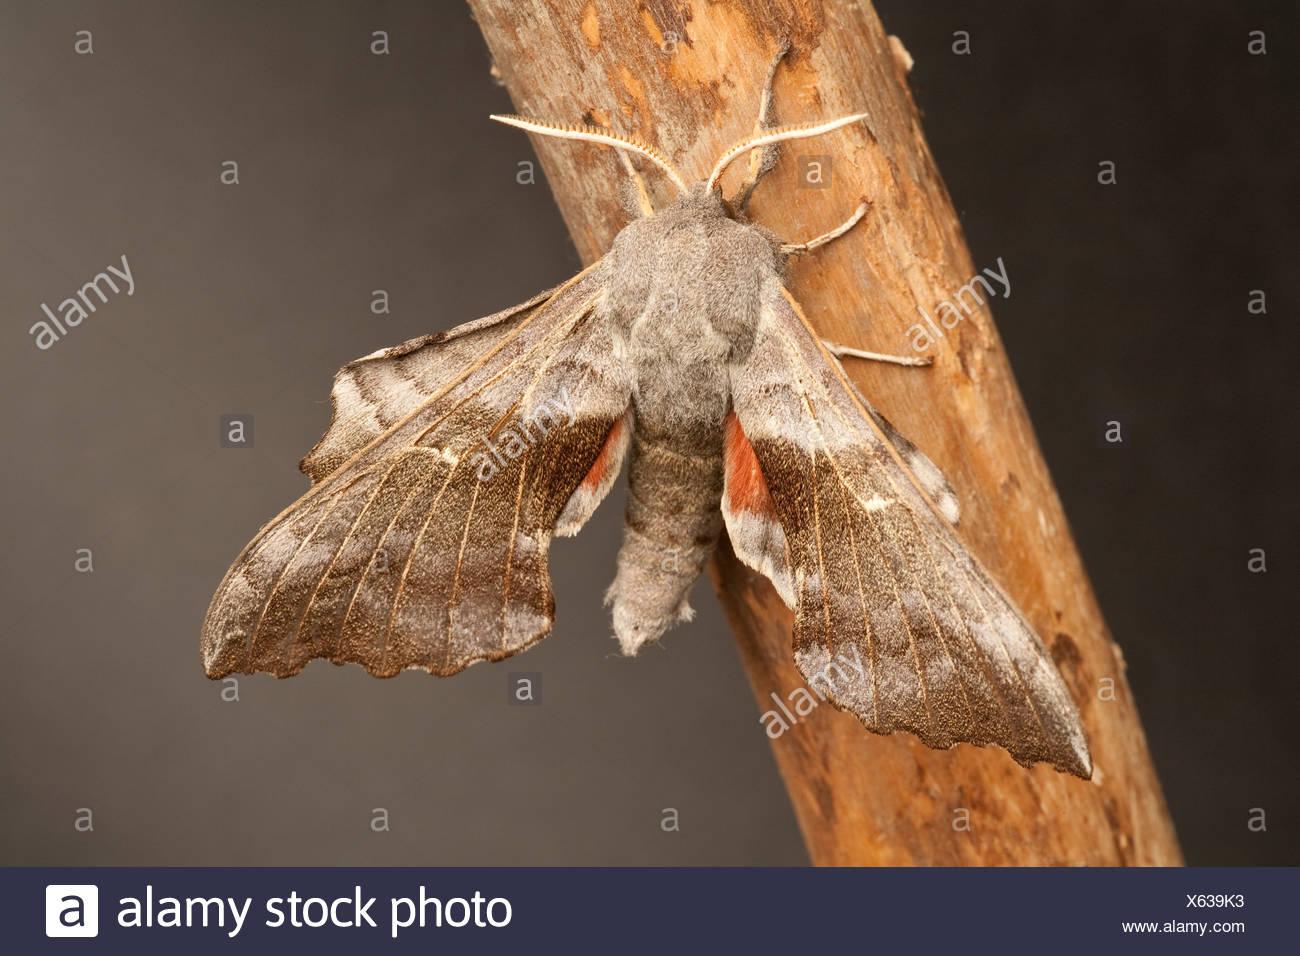 Poplar Hawkmoth Loathoe populi - Stock Image